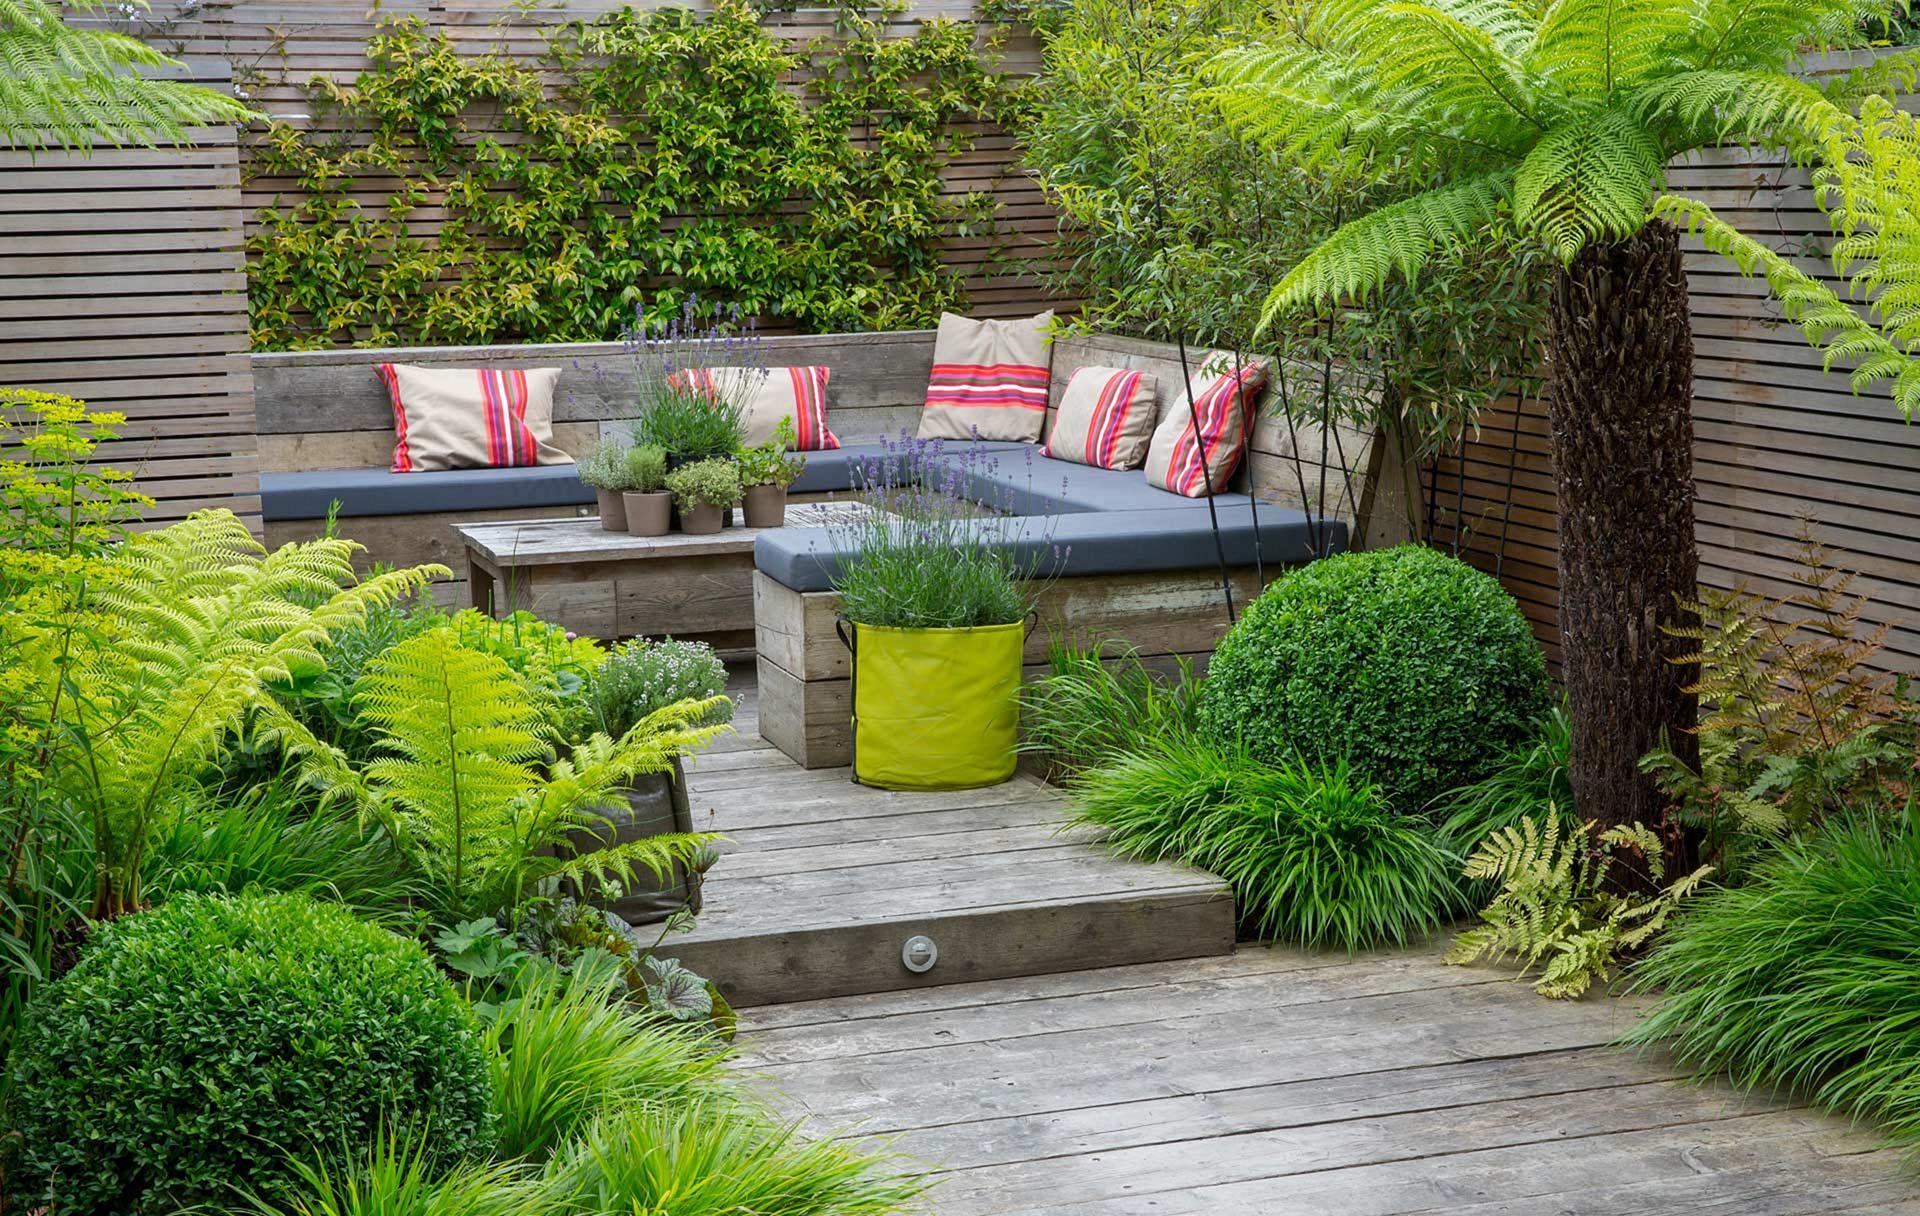 Garden Design Ideas With Seating Area 20